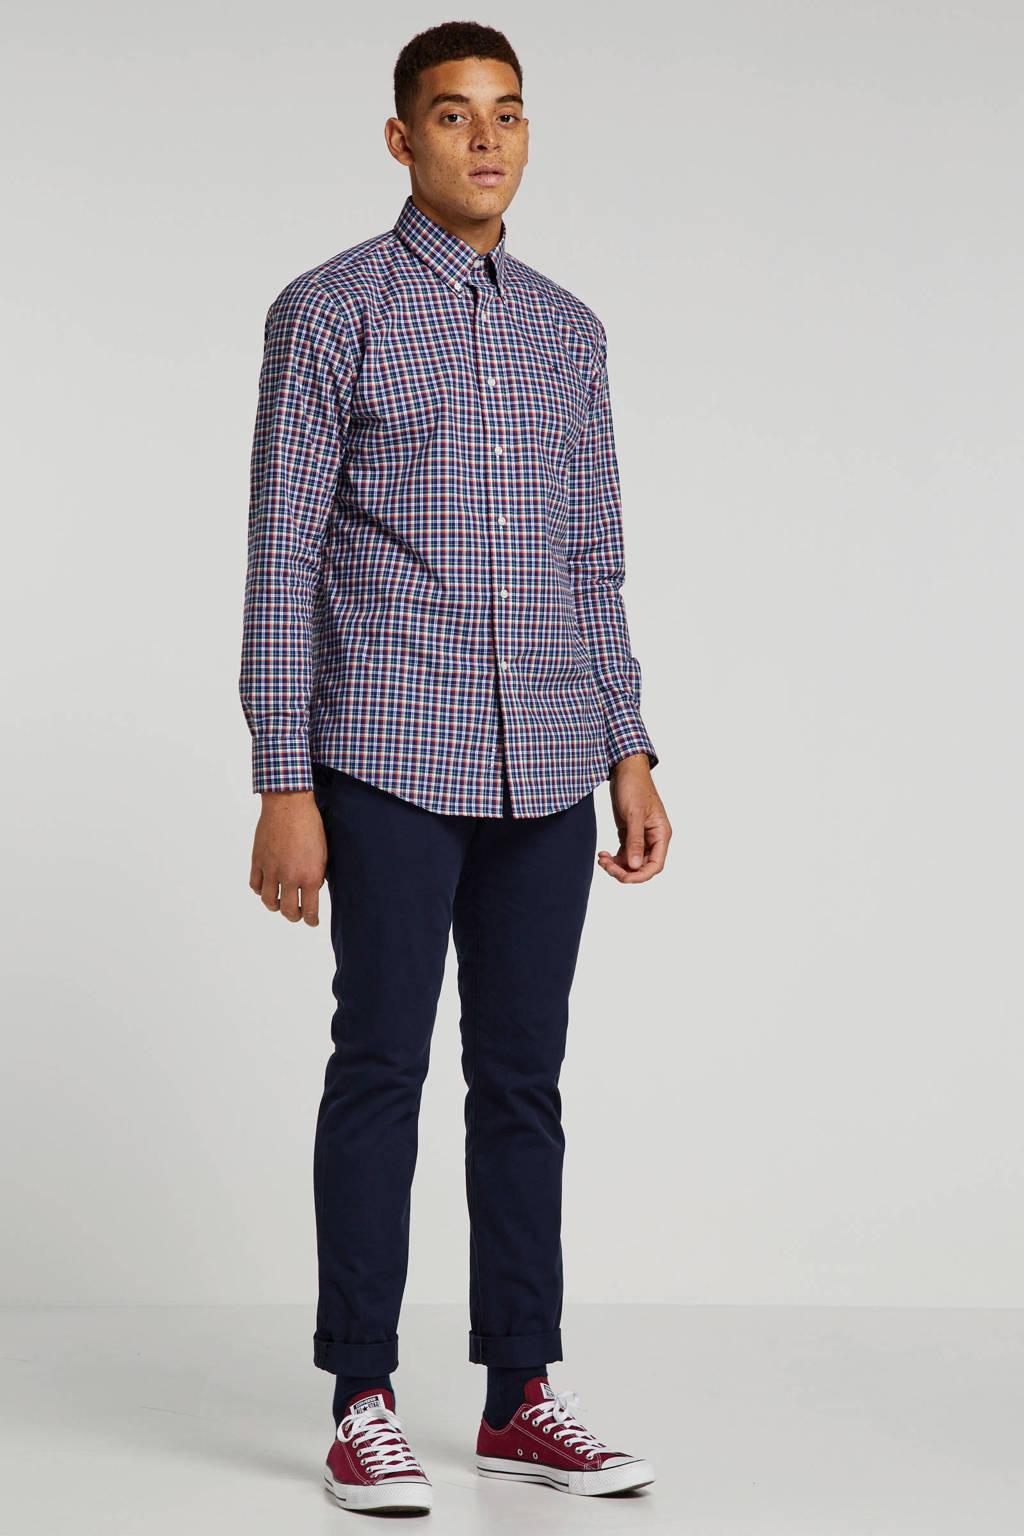 POLO Ralph Lauren geruit slim fit overhemd blauw/groen/rood/wit, Blauw/groen/rood/wit